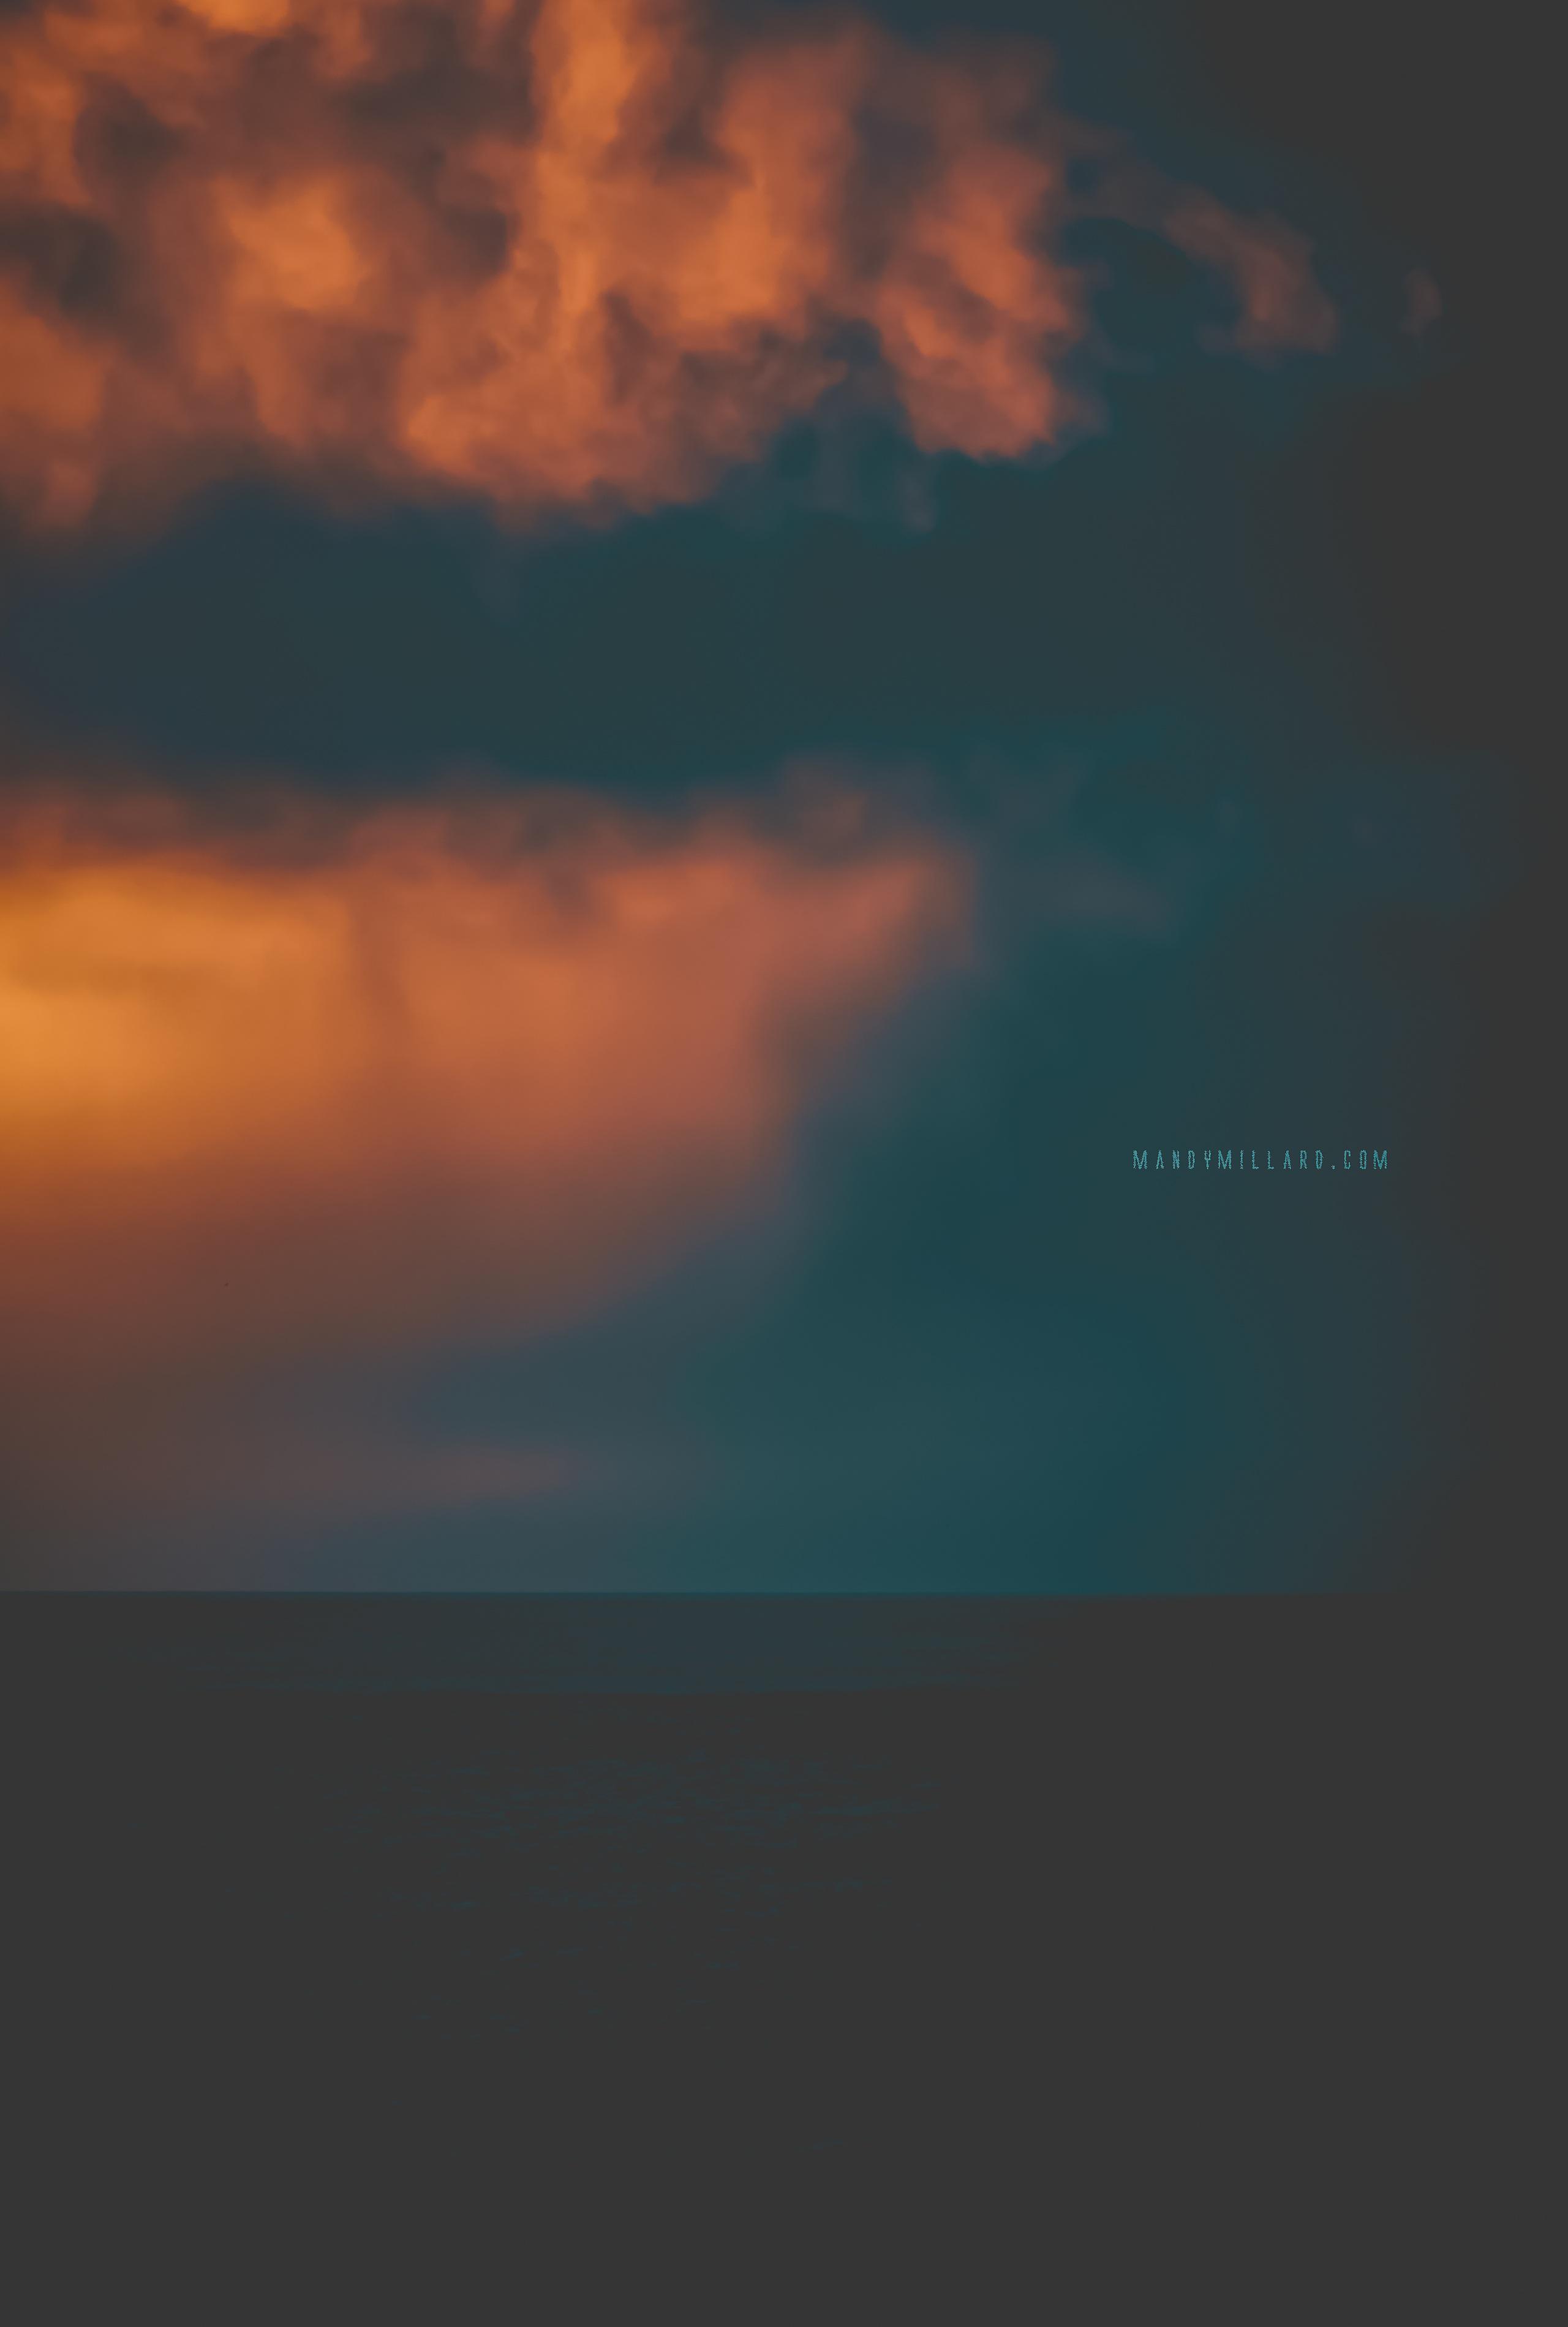 Fine-art seascape photographic print